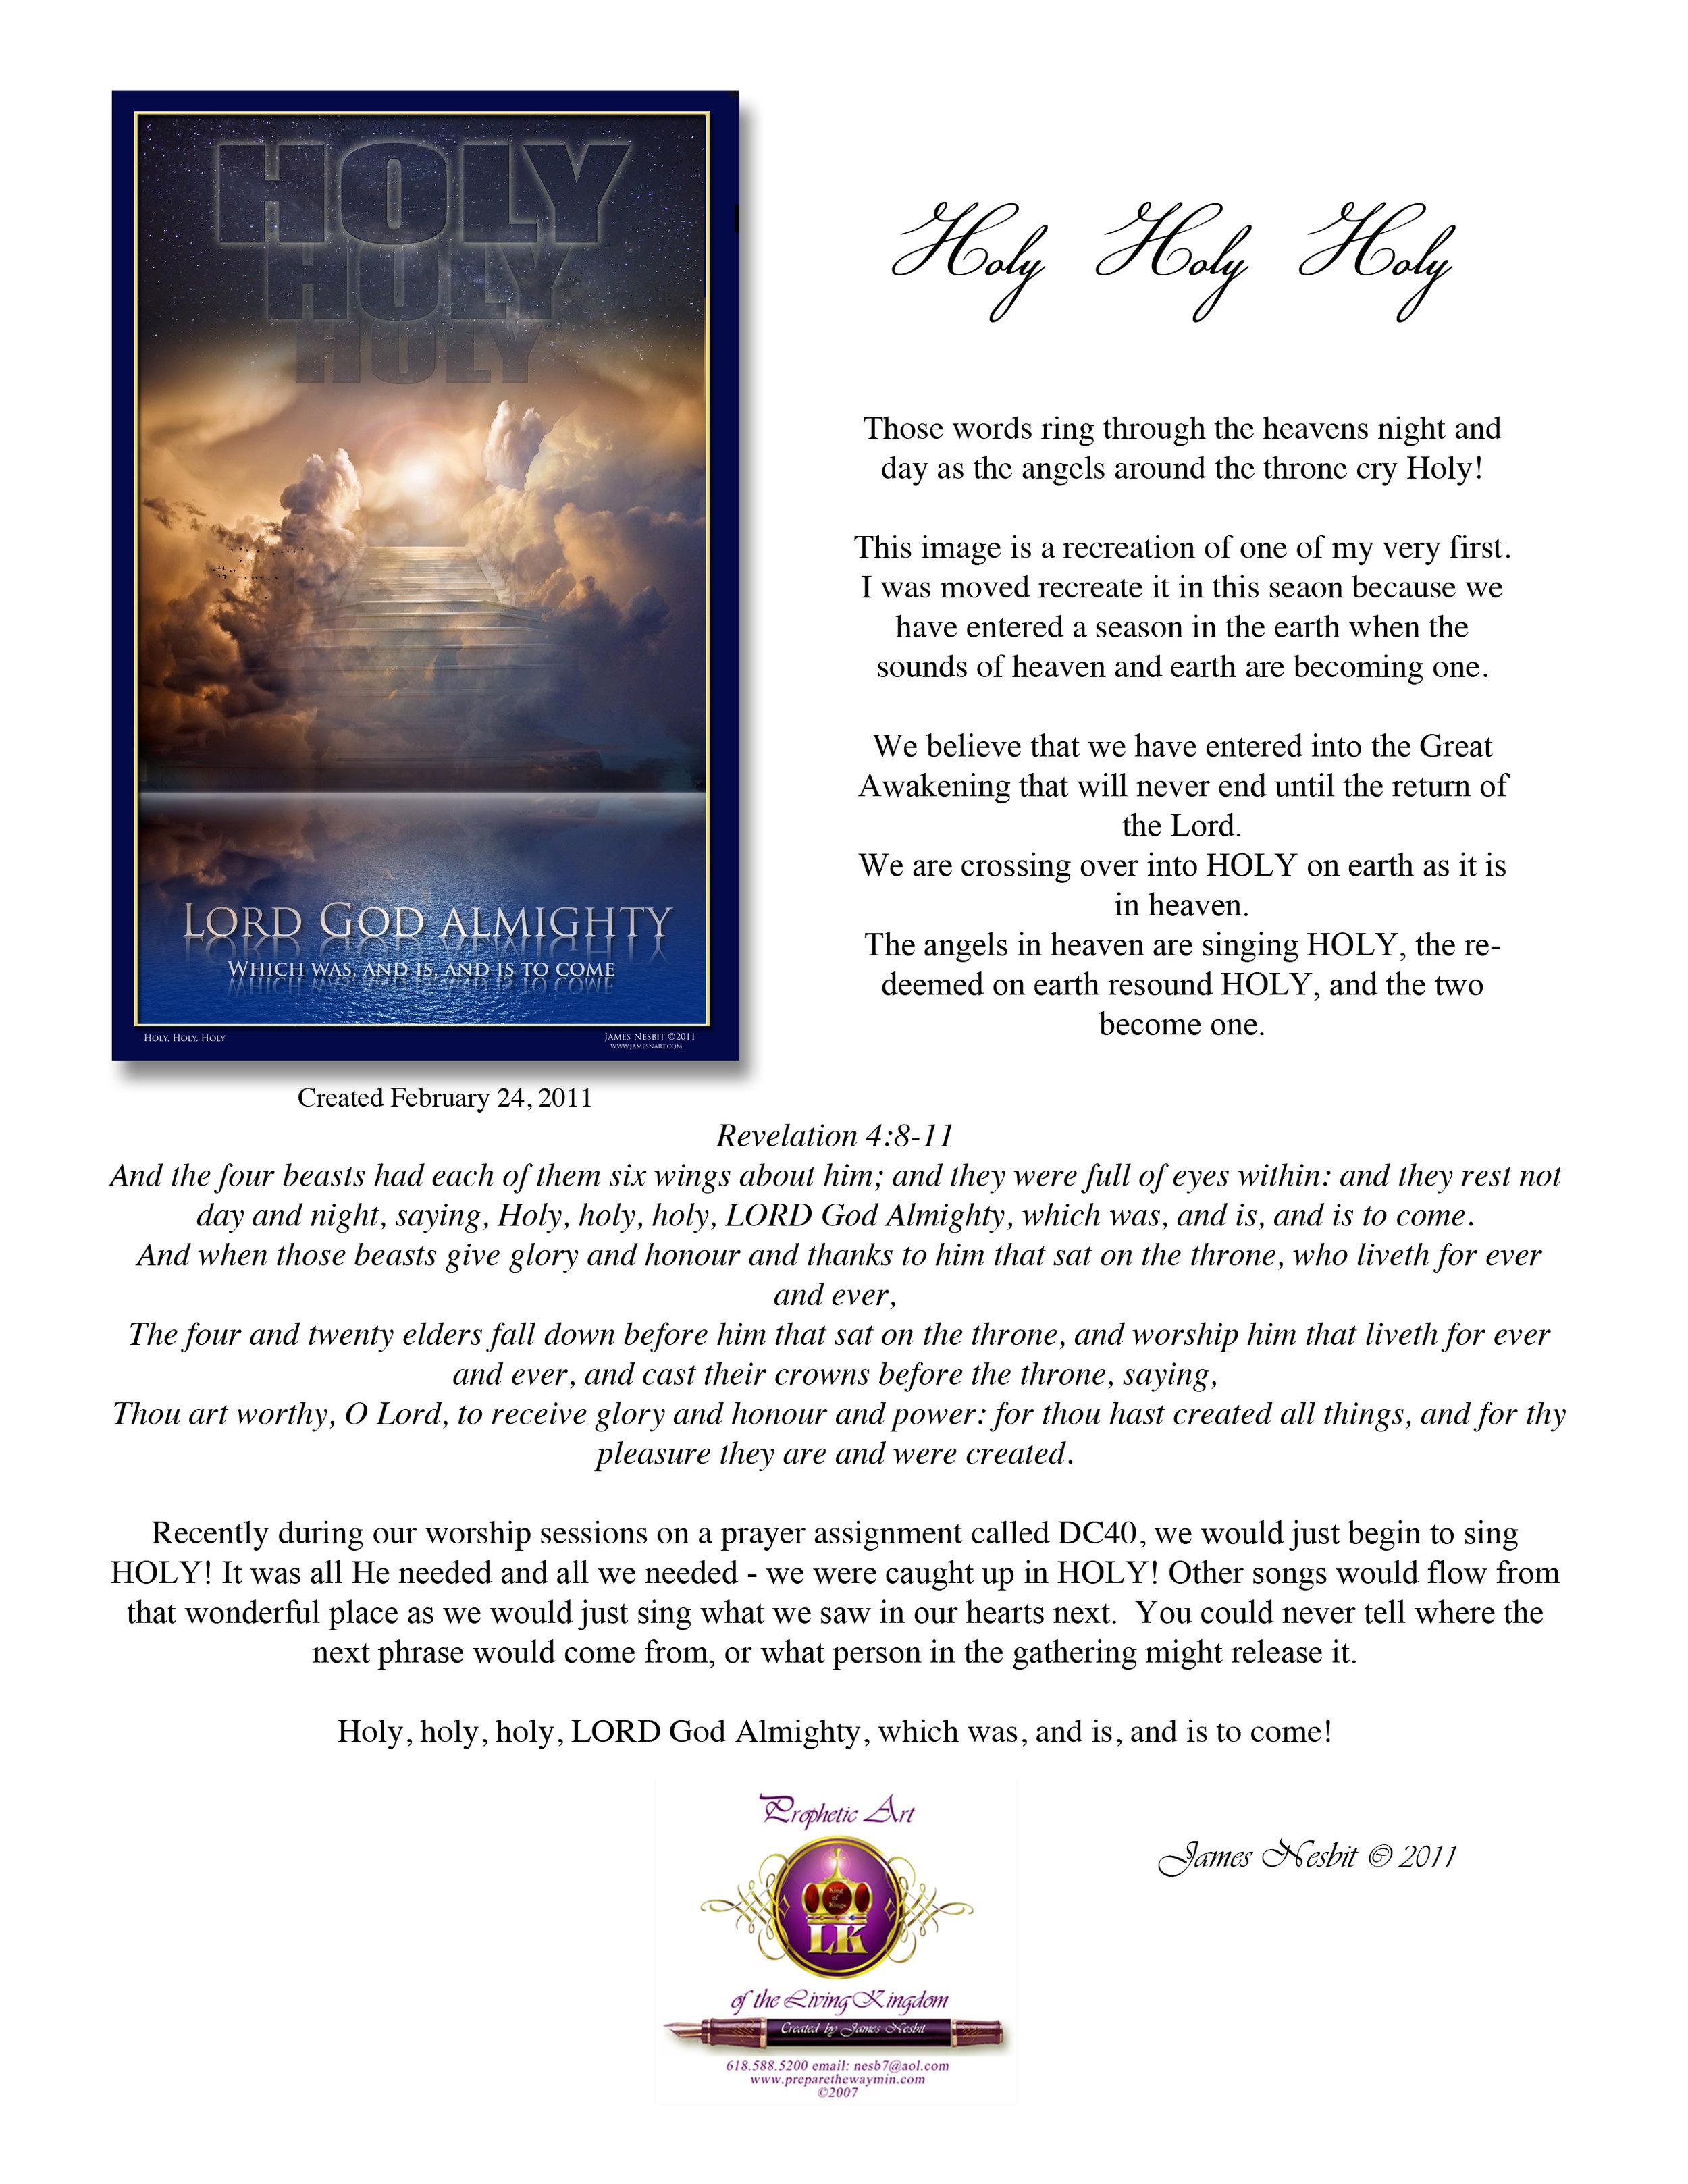 New Holy Description copy.jpg